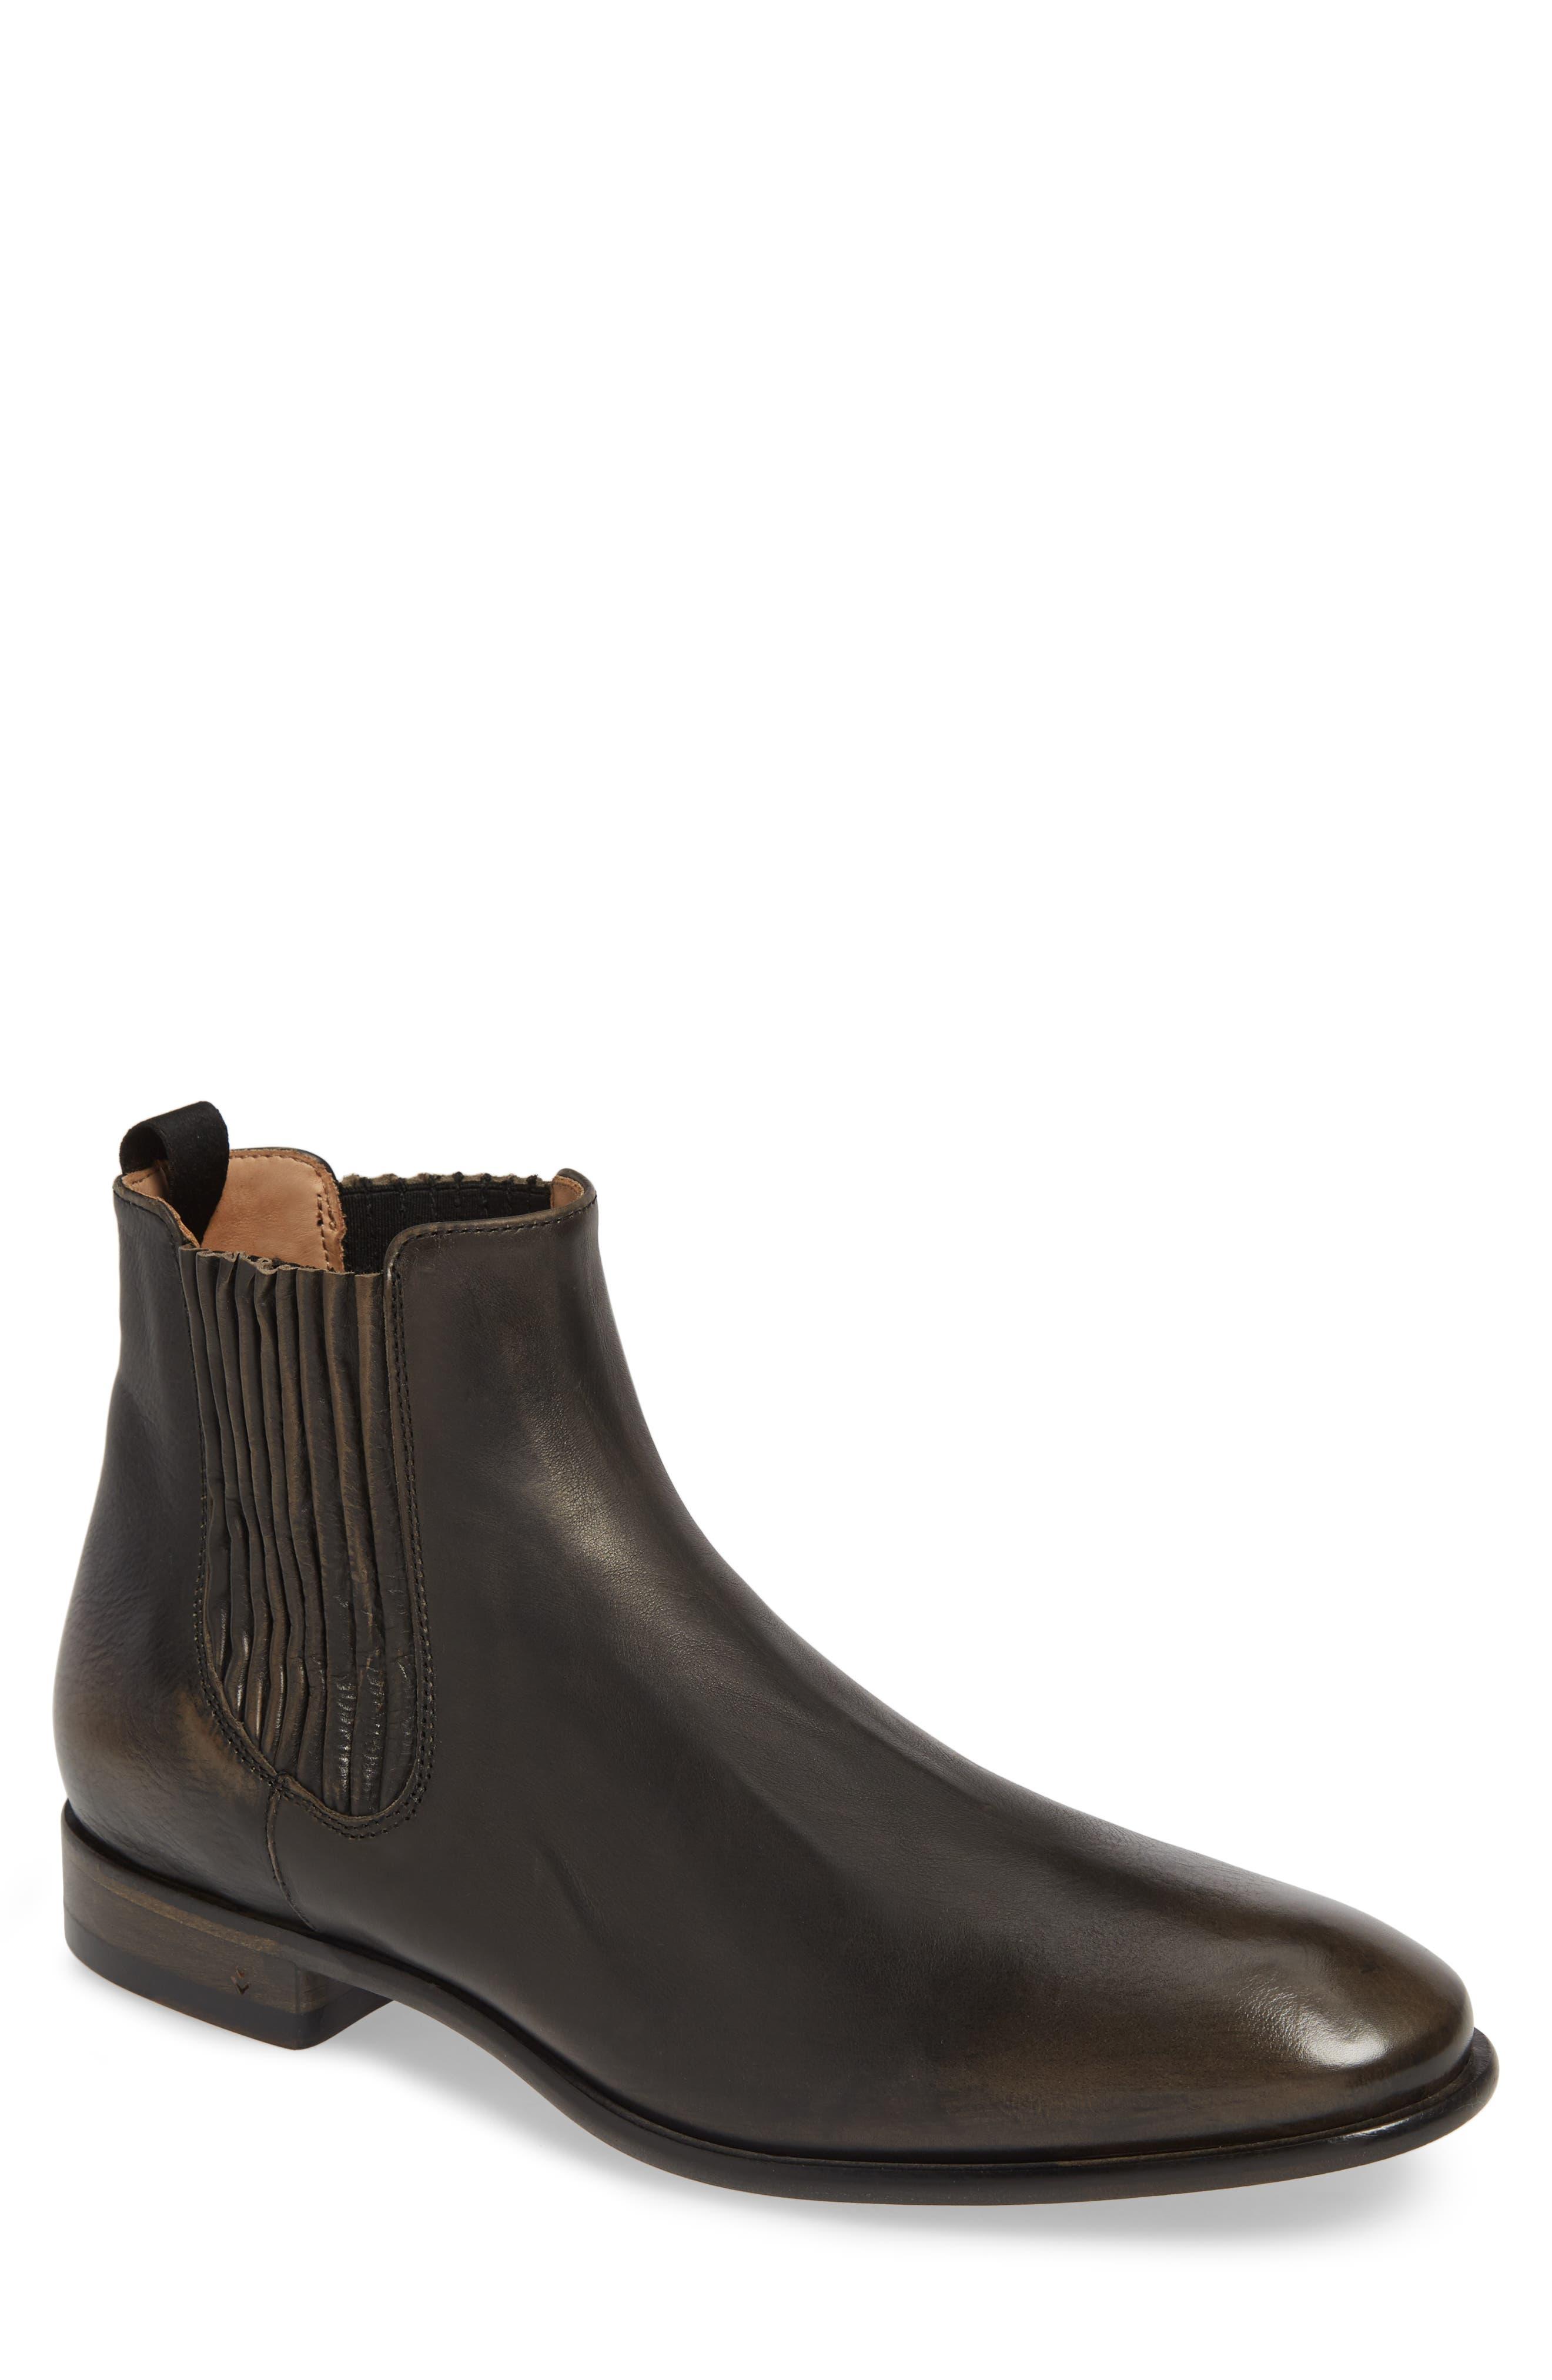 JOHN VARVATOS COLLECTION Eldridge Chelsea Boot, Main, color, CHARCOAL